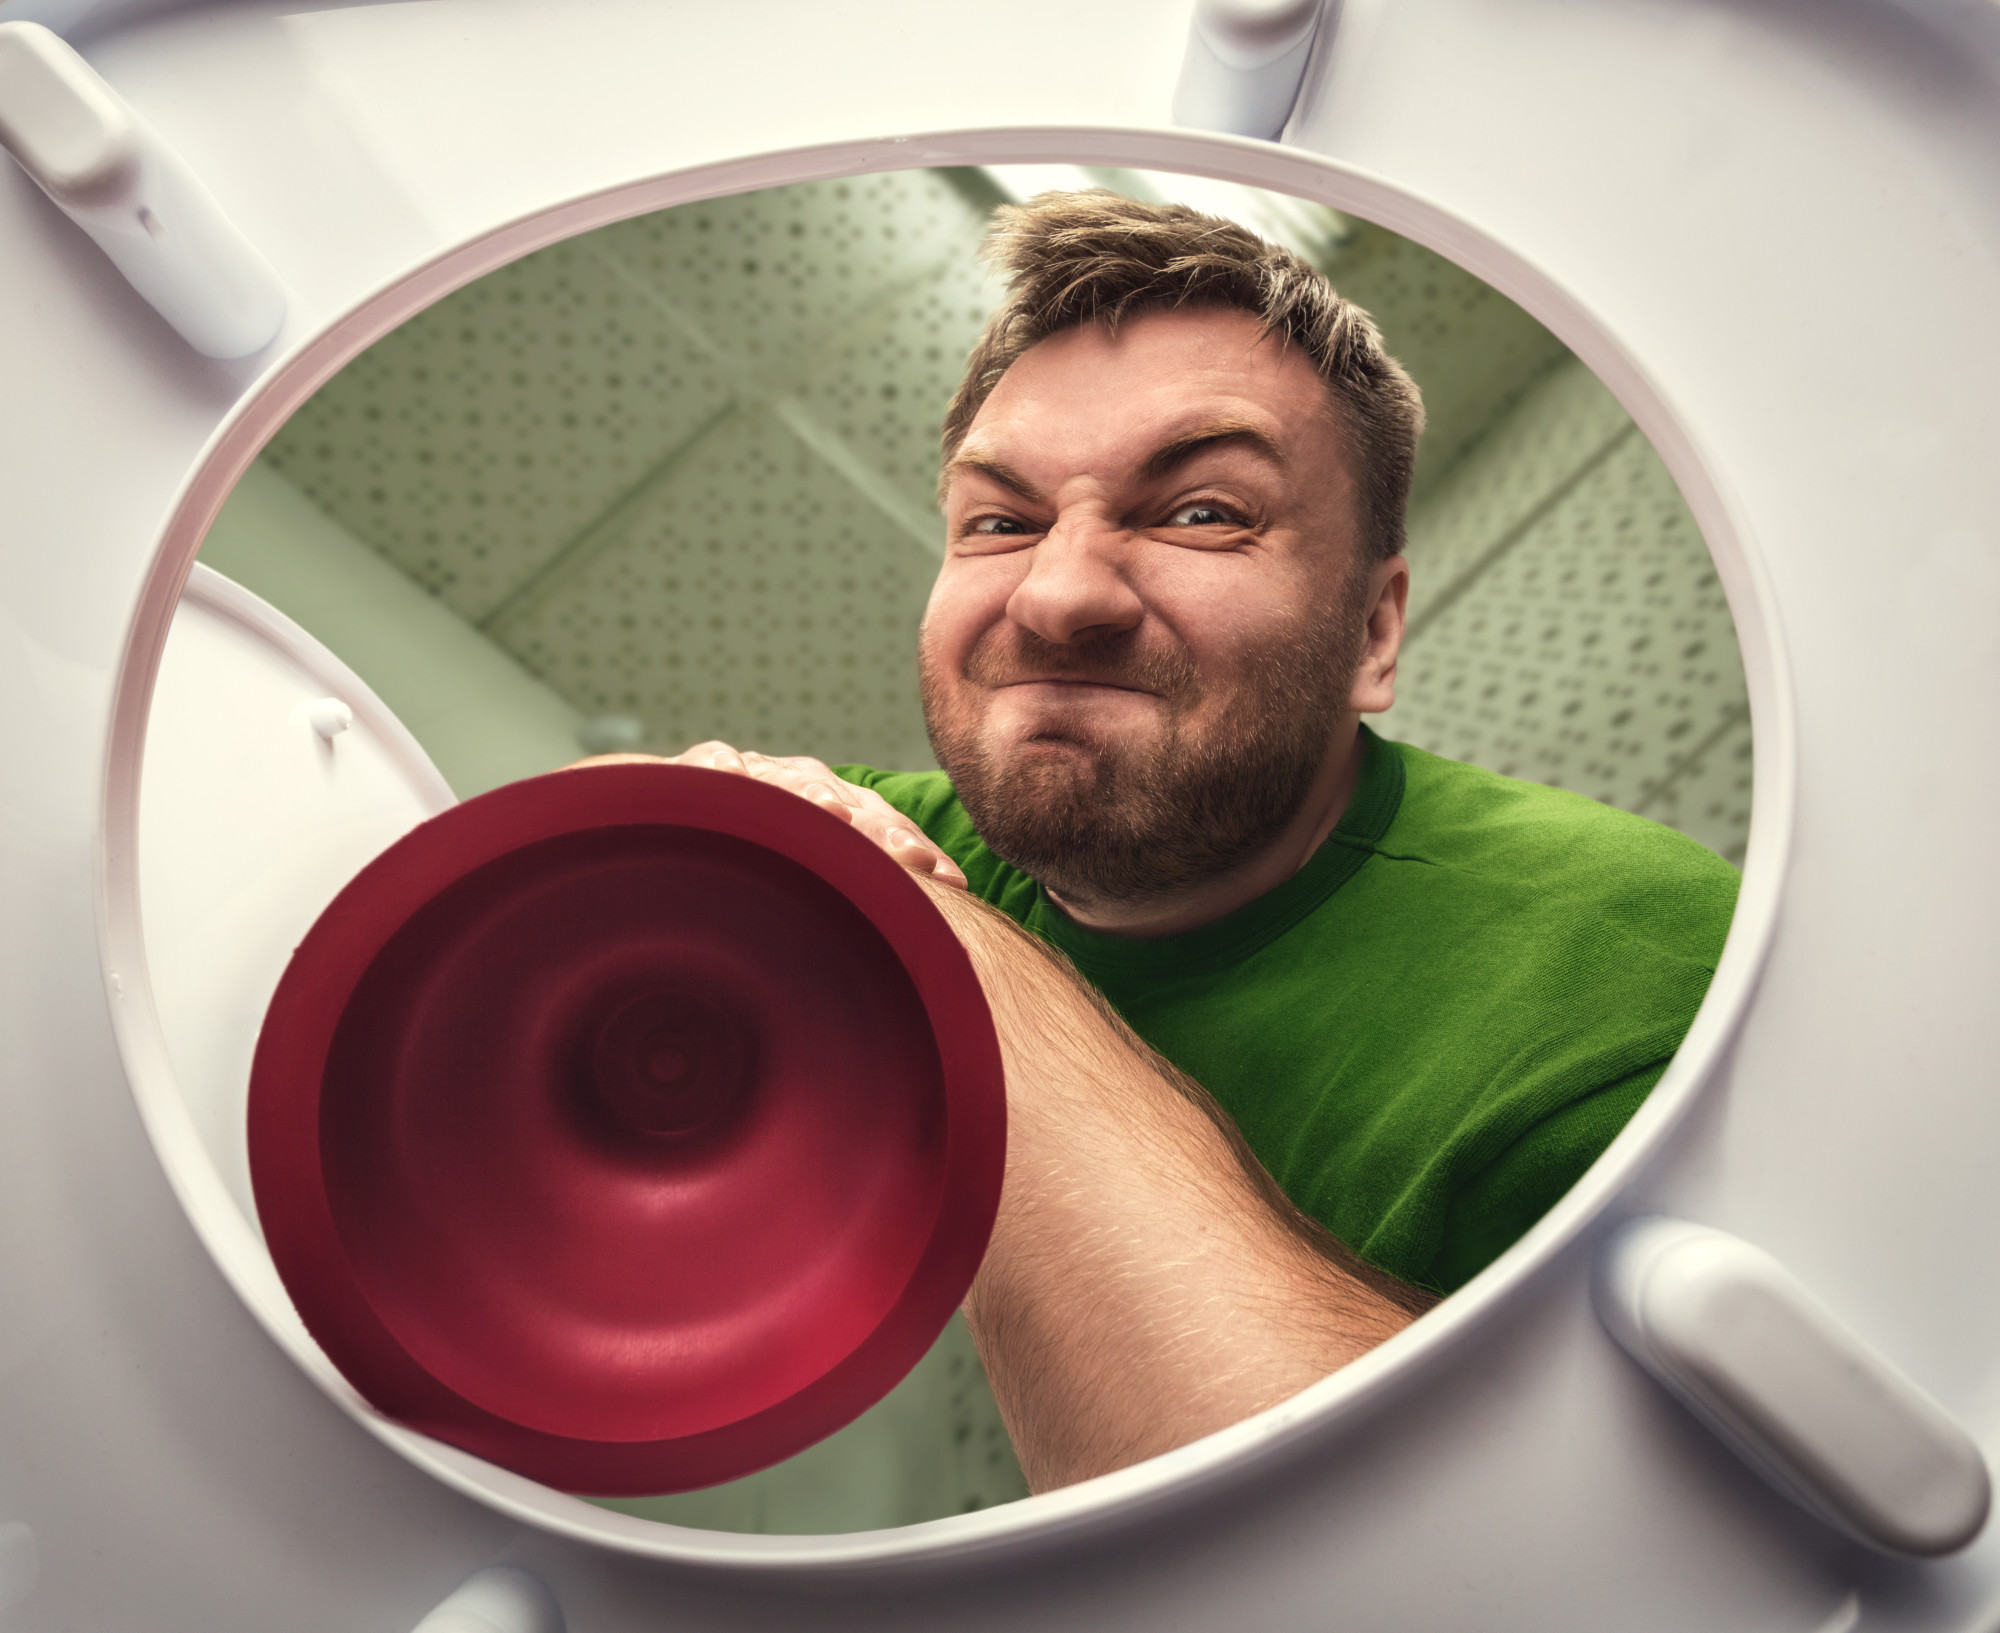 my toilet won't flush